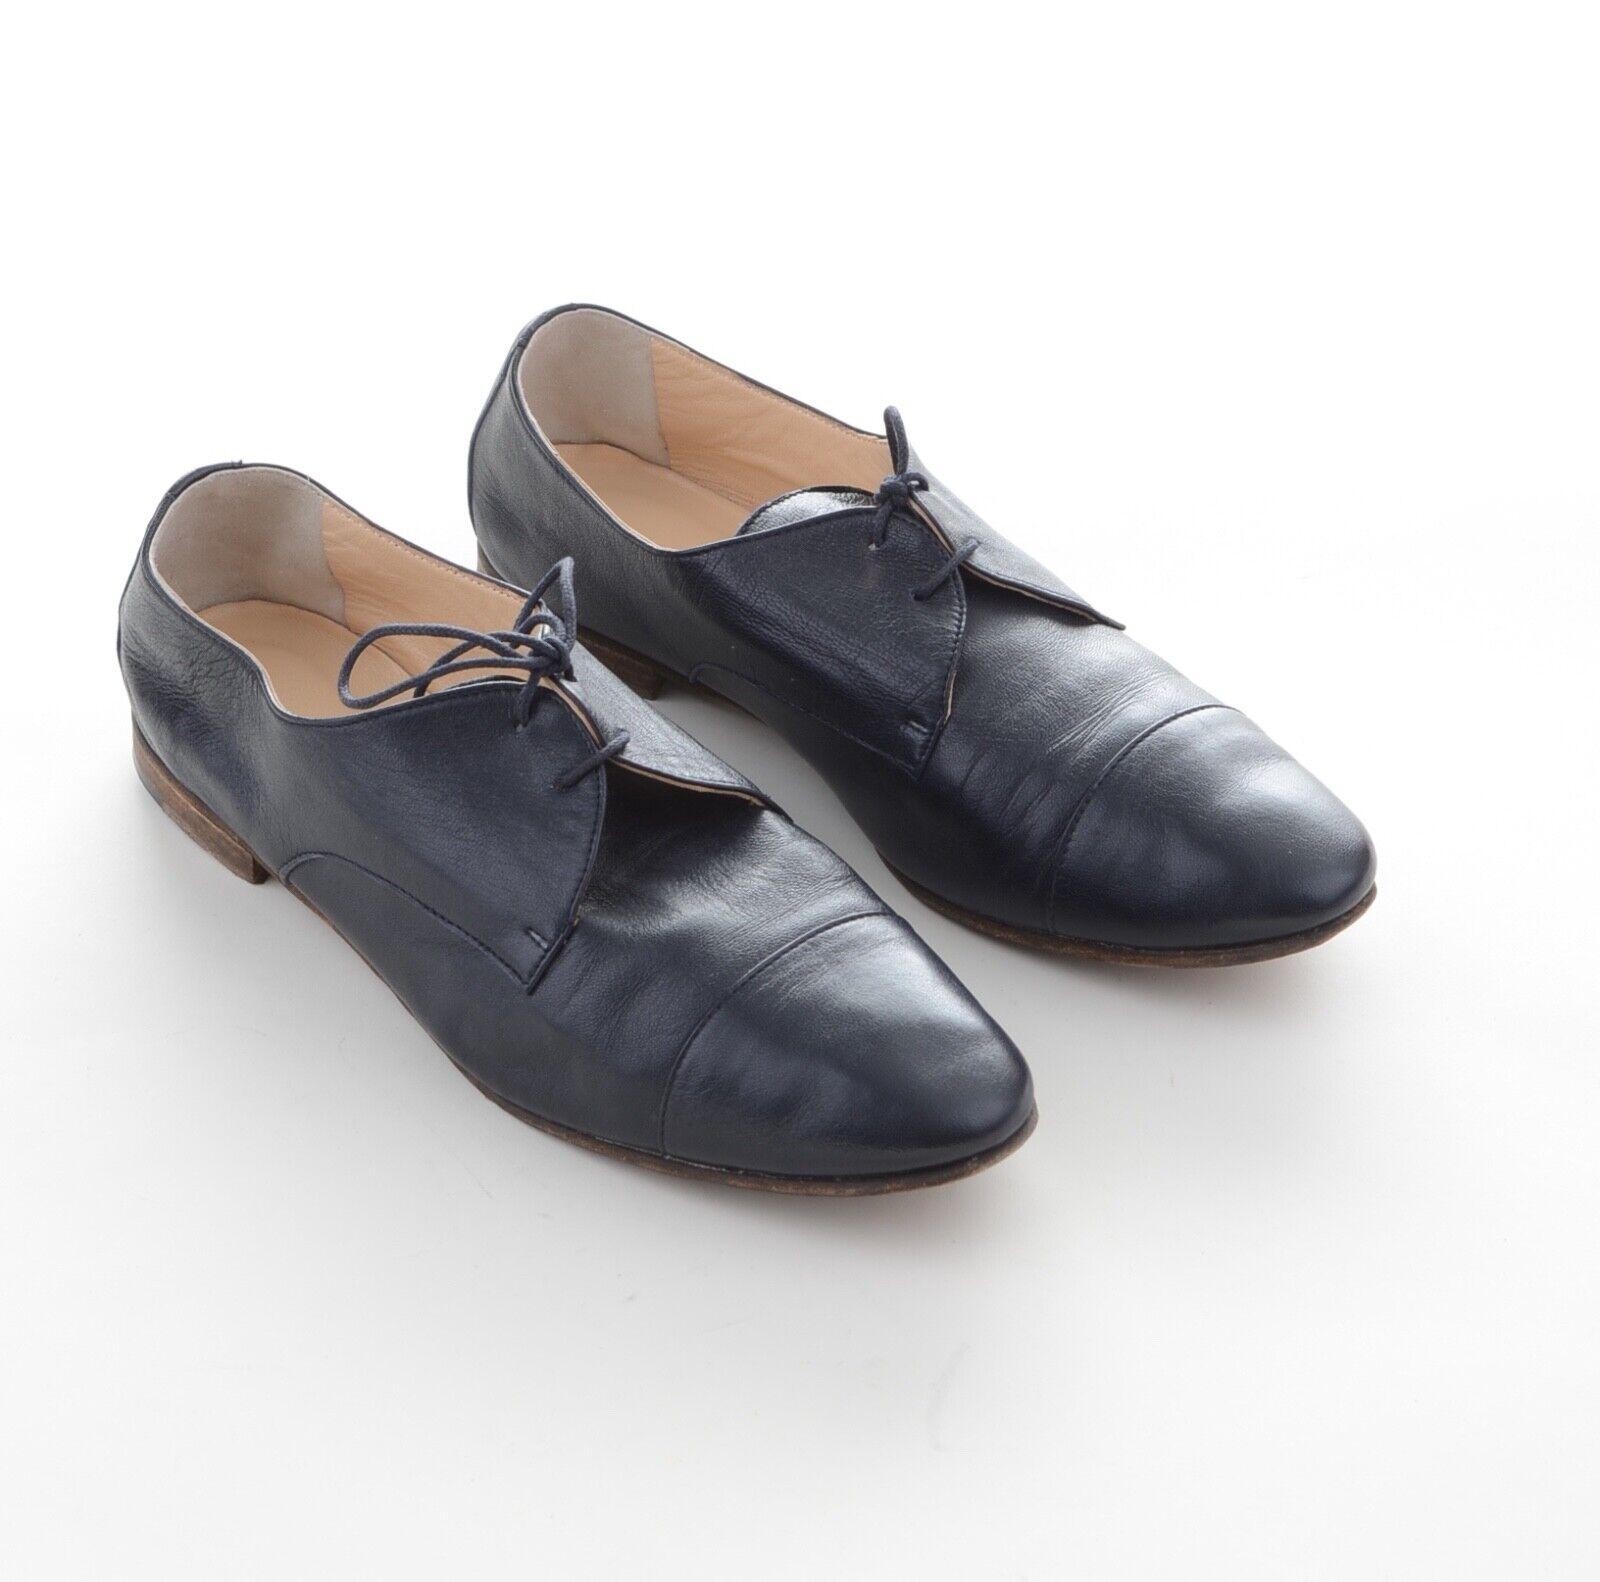 Schoschuhe Designer Damen Halb Schuhe Gr.40 Dunkelblau